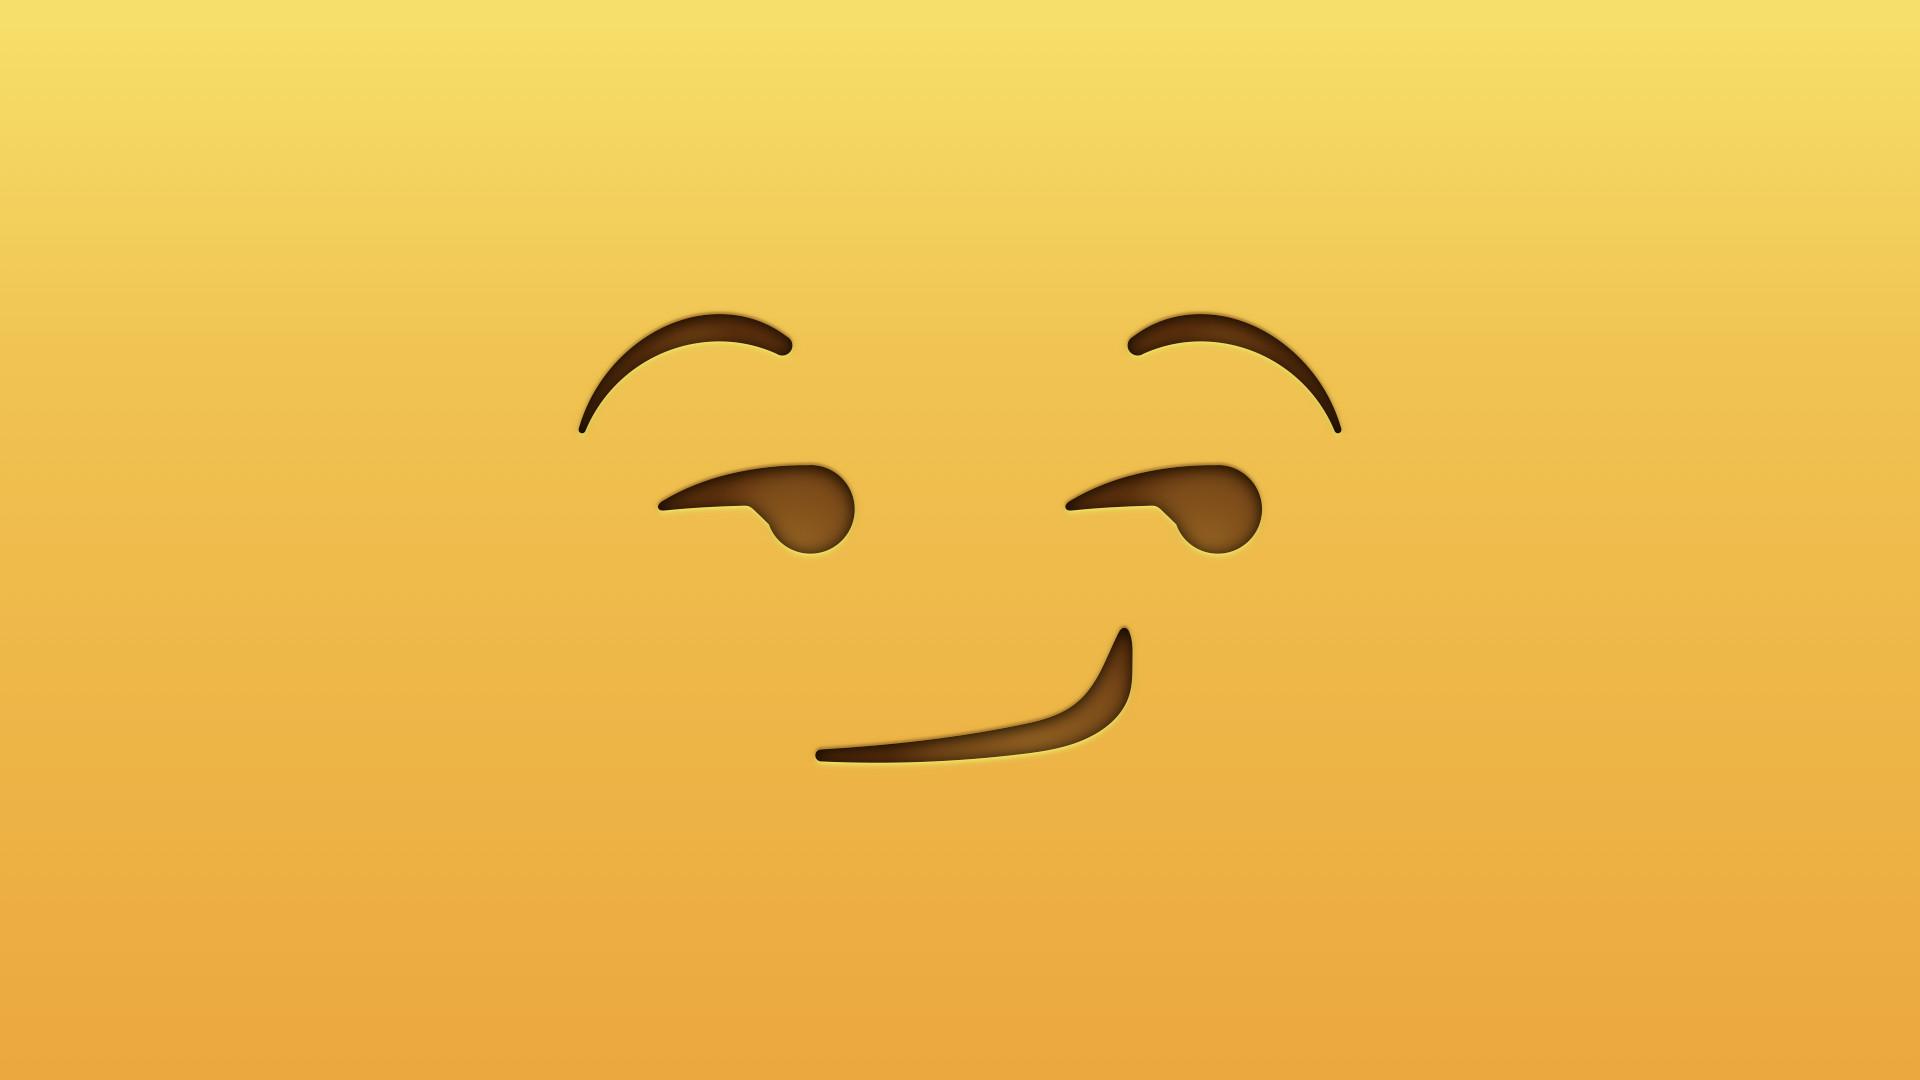 19] Smirk Emoji Wallpapers On Wallpapersafari - Emoji Desktop Backgrounds , HD Wallpaper & Backgrounds